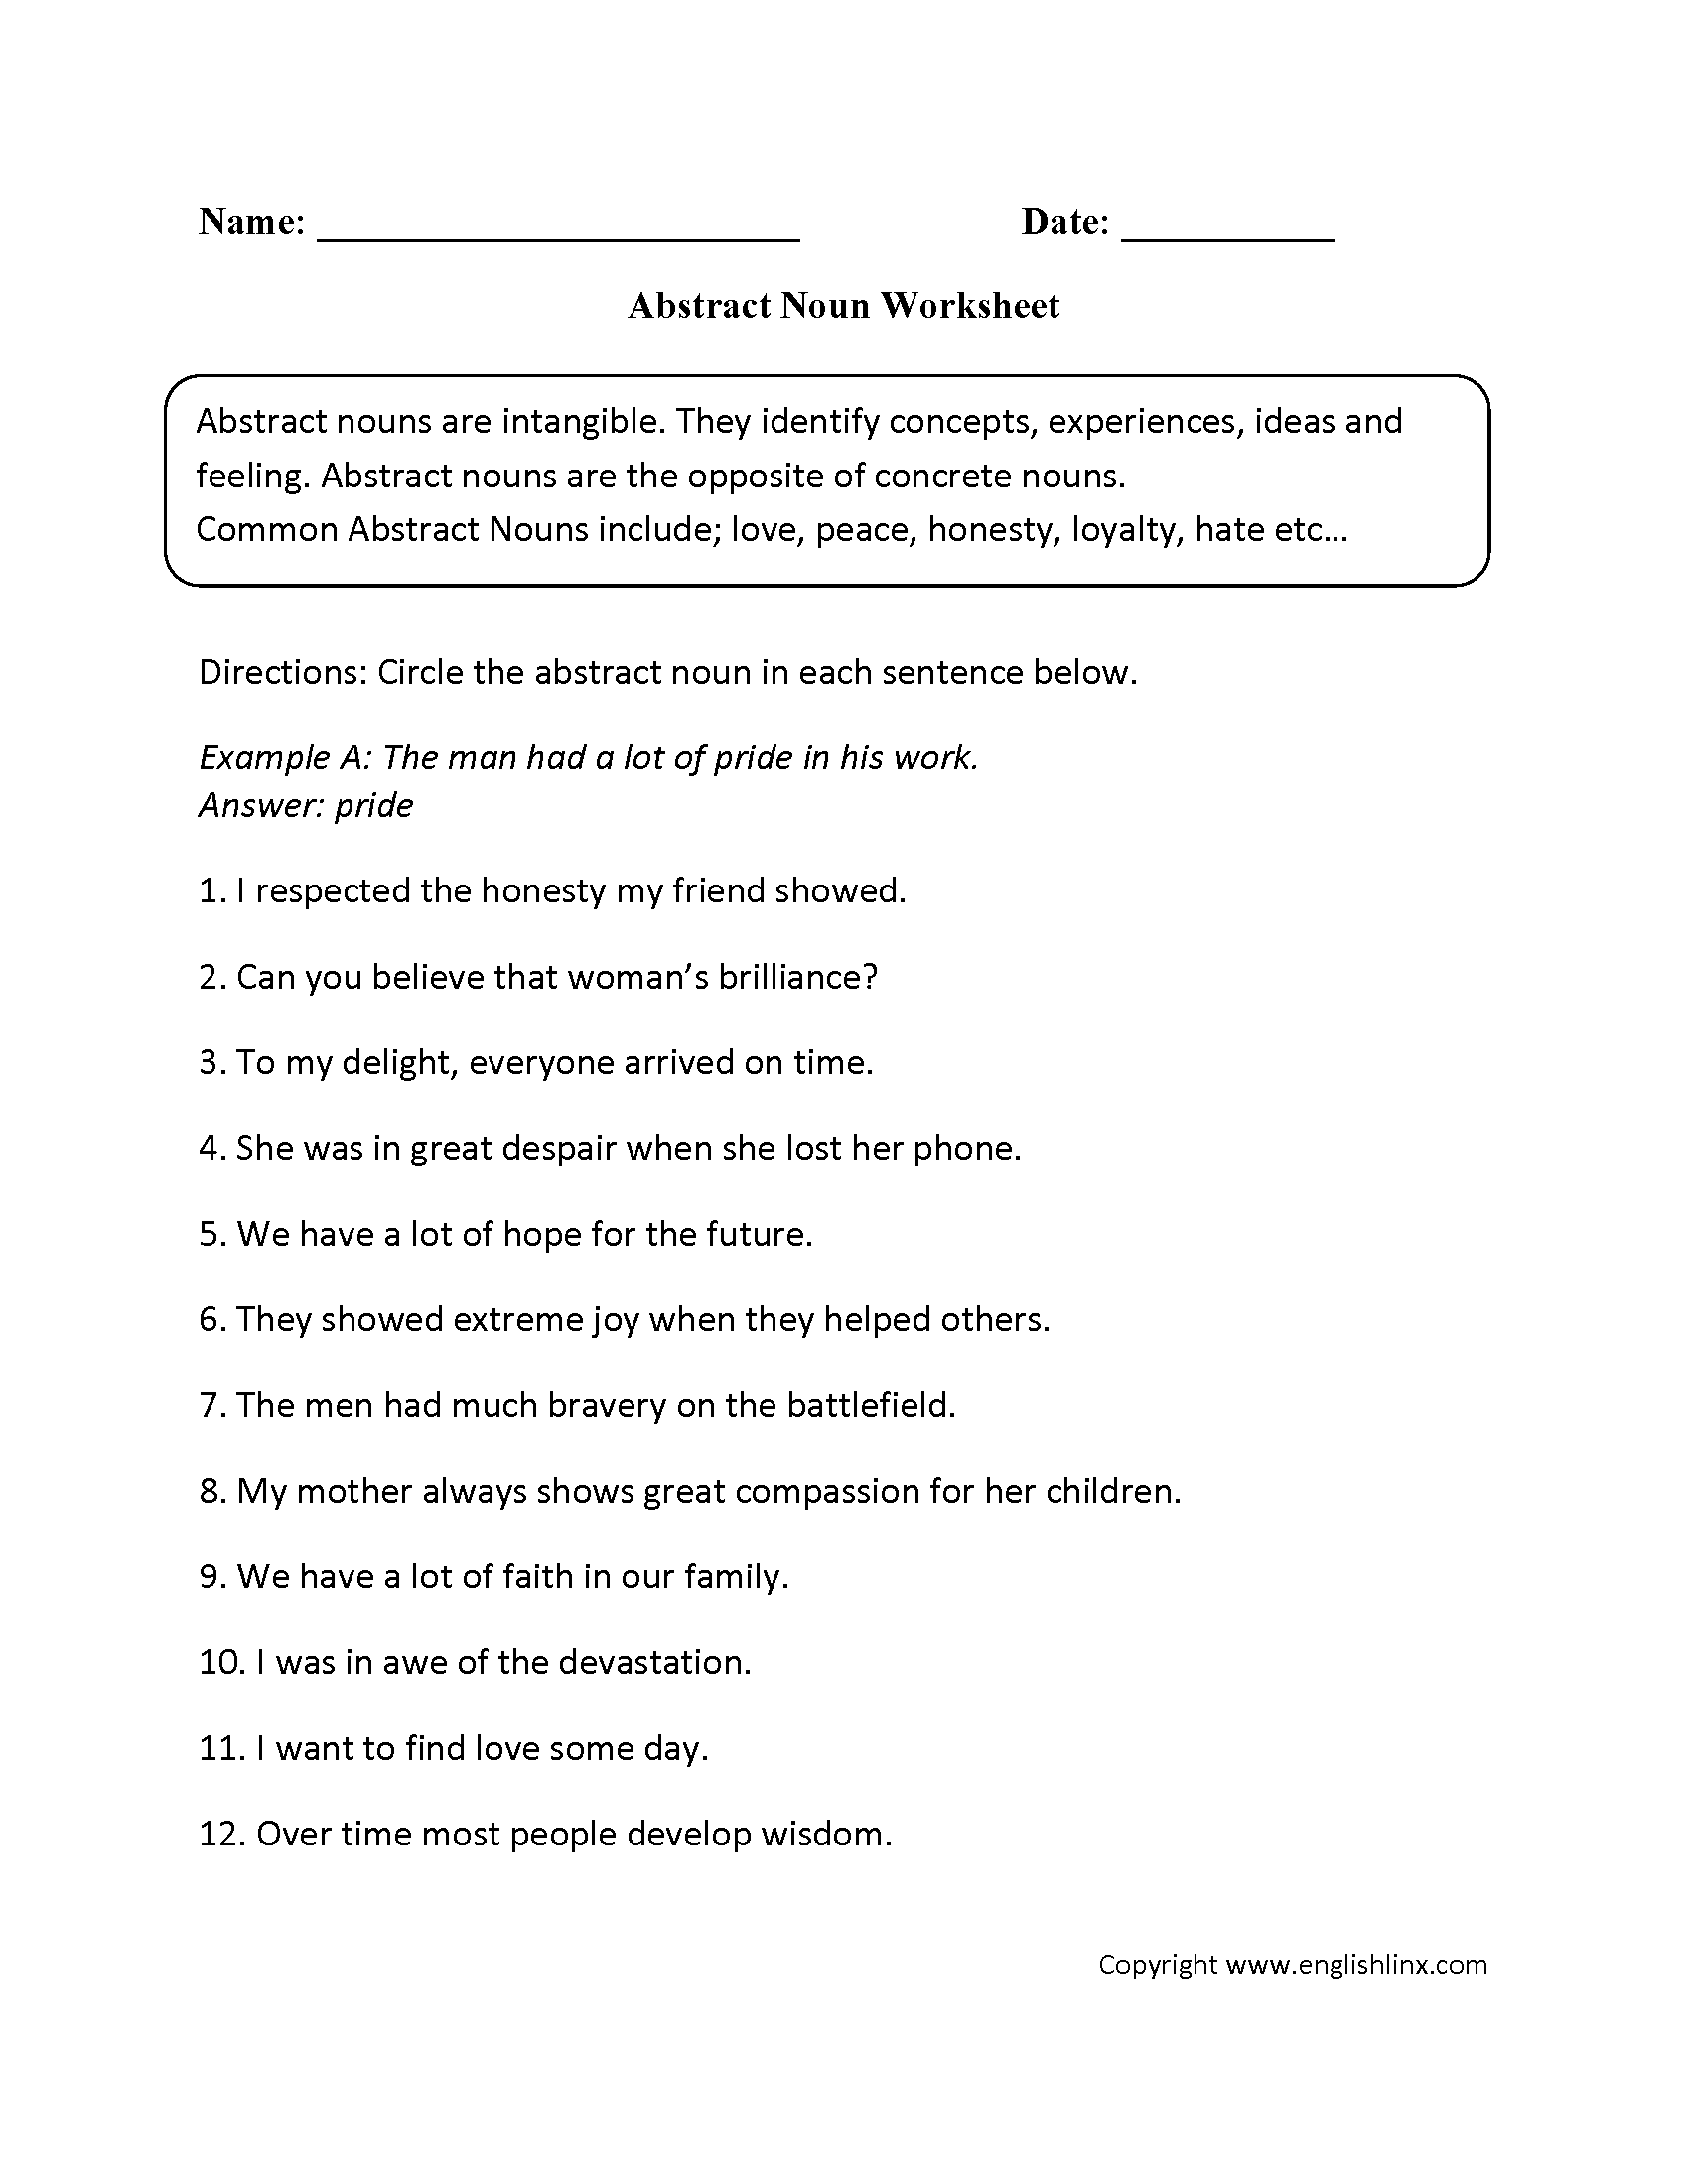 Abstract Noun Worksheet